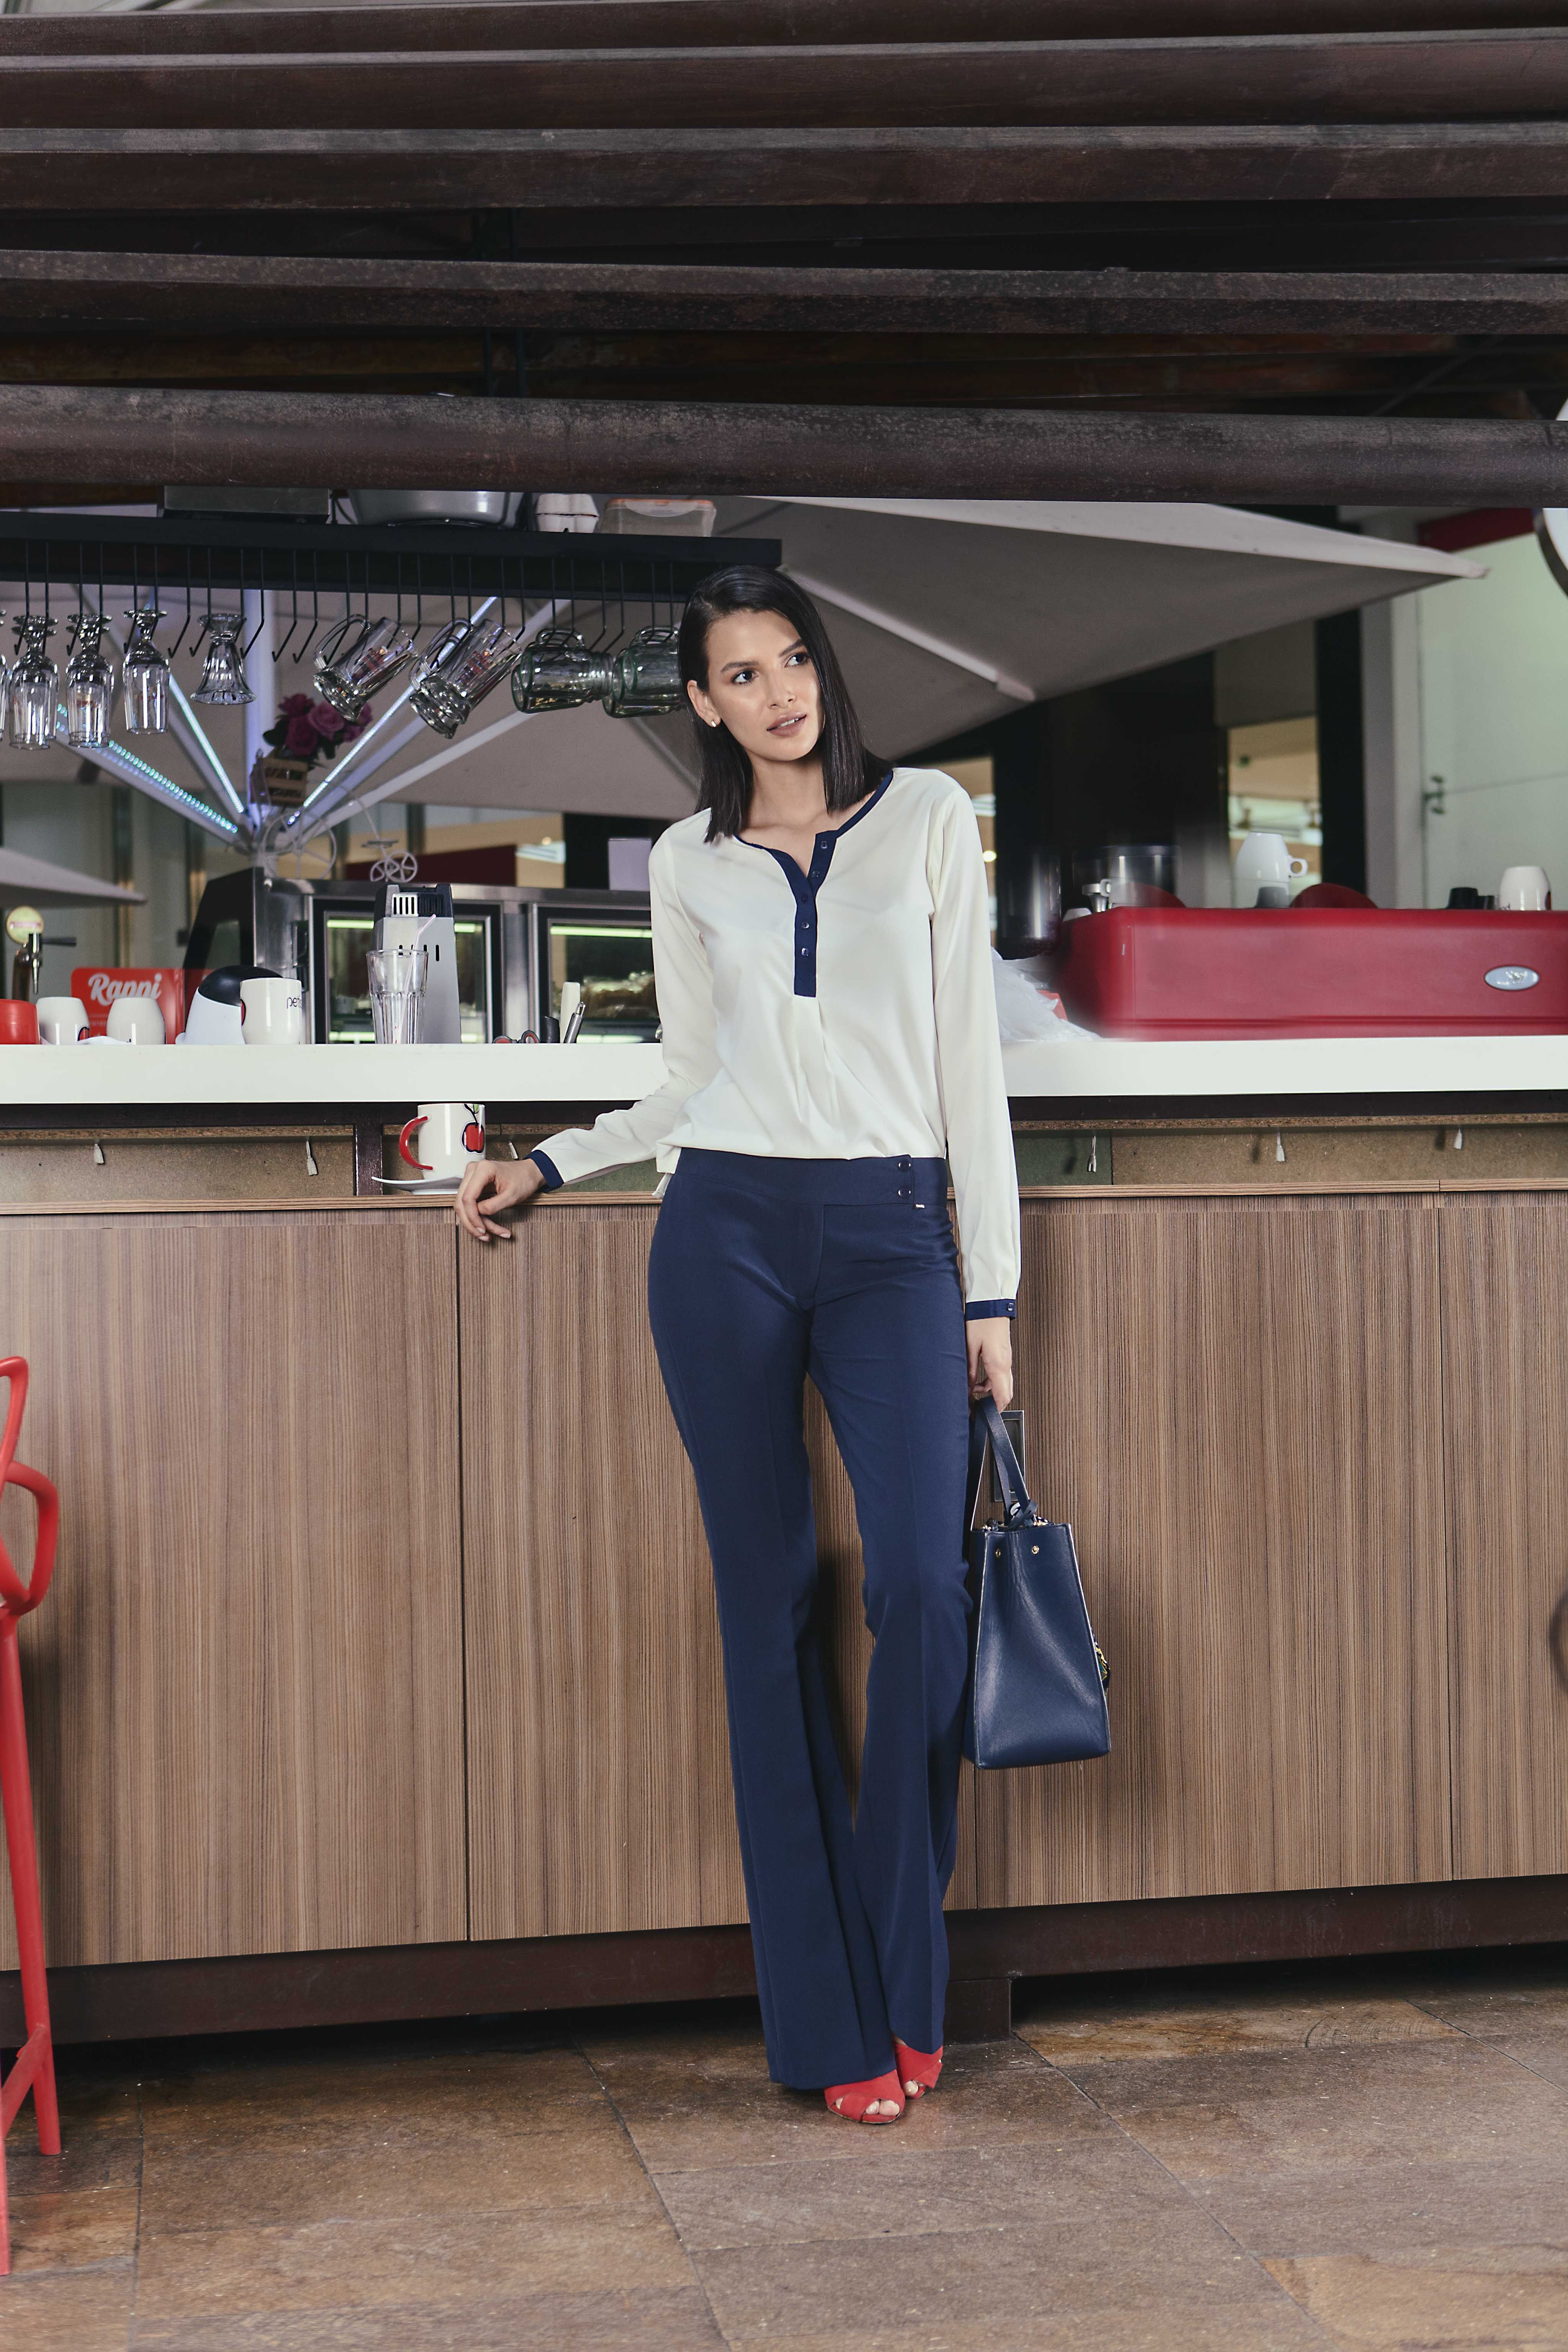 6478312d9  estilo  moda  ejecutiva  modaejecutiva  oficina  formal  mujer  colombia   panama